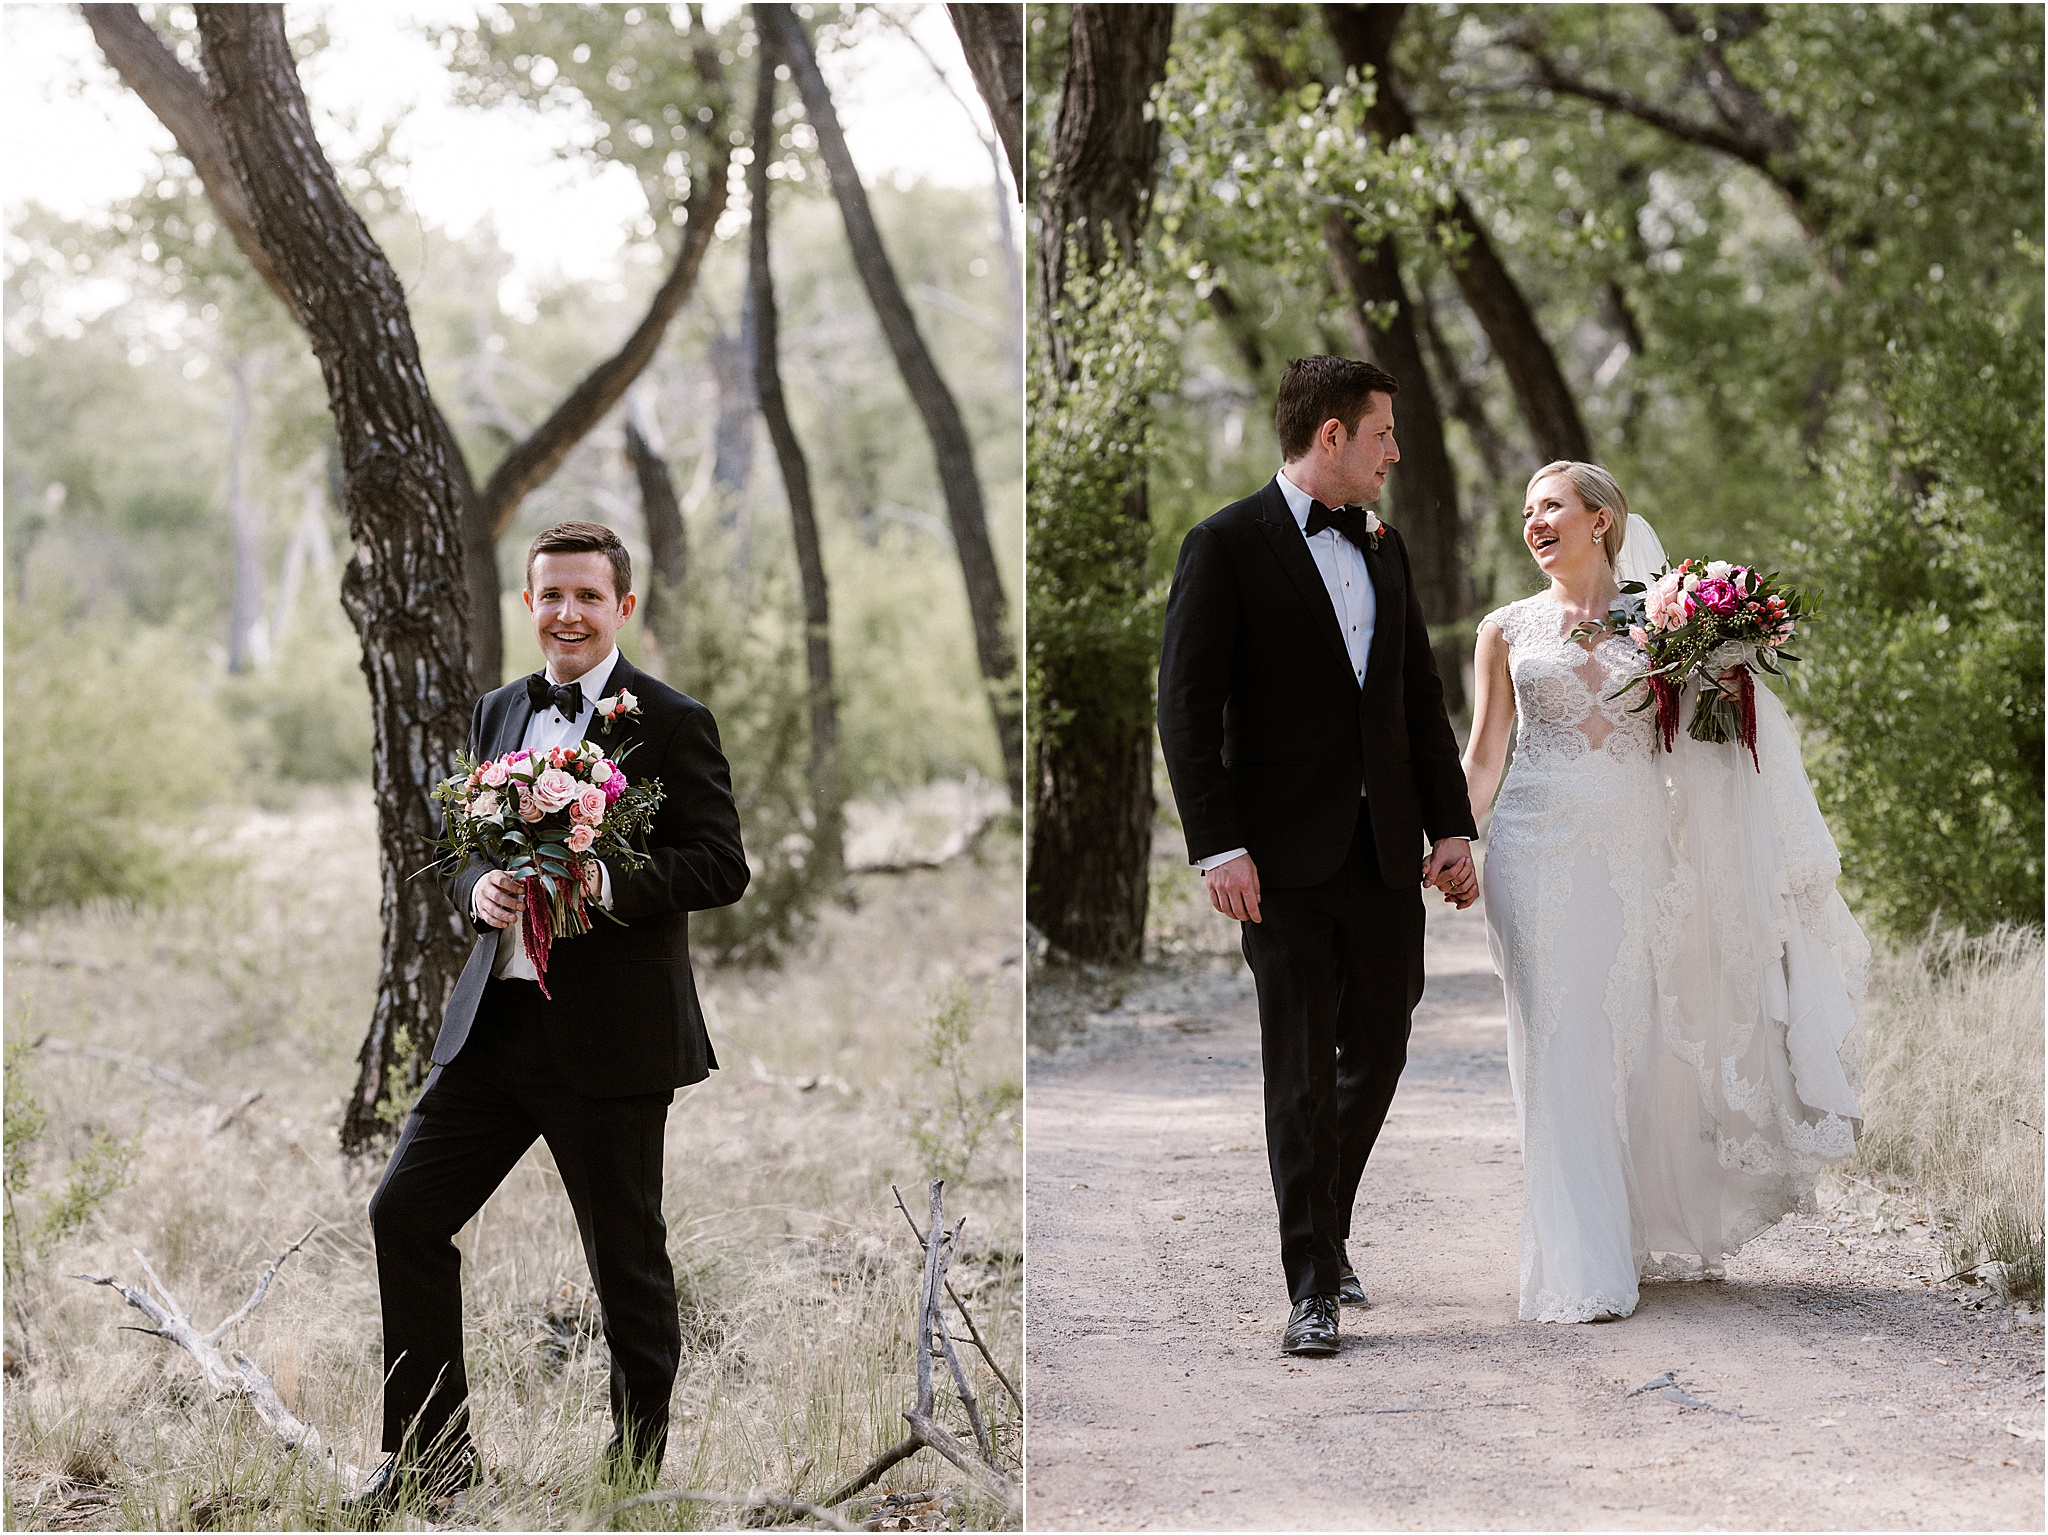 JENNA_JEROME_BLUE ROSE PHOTOGRAPHY_ABQ WEDDING_34